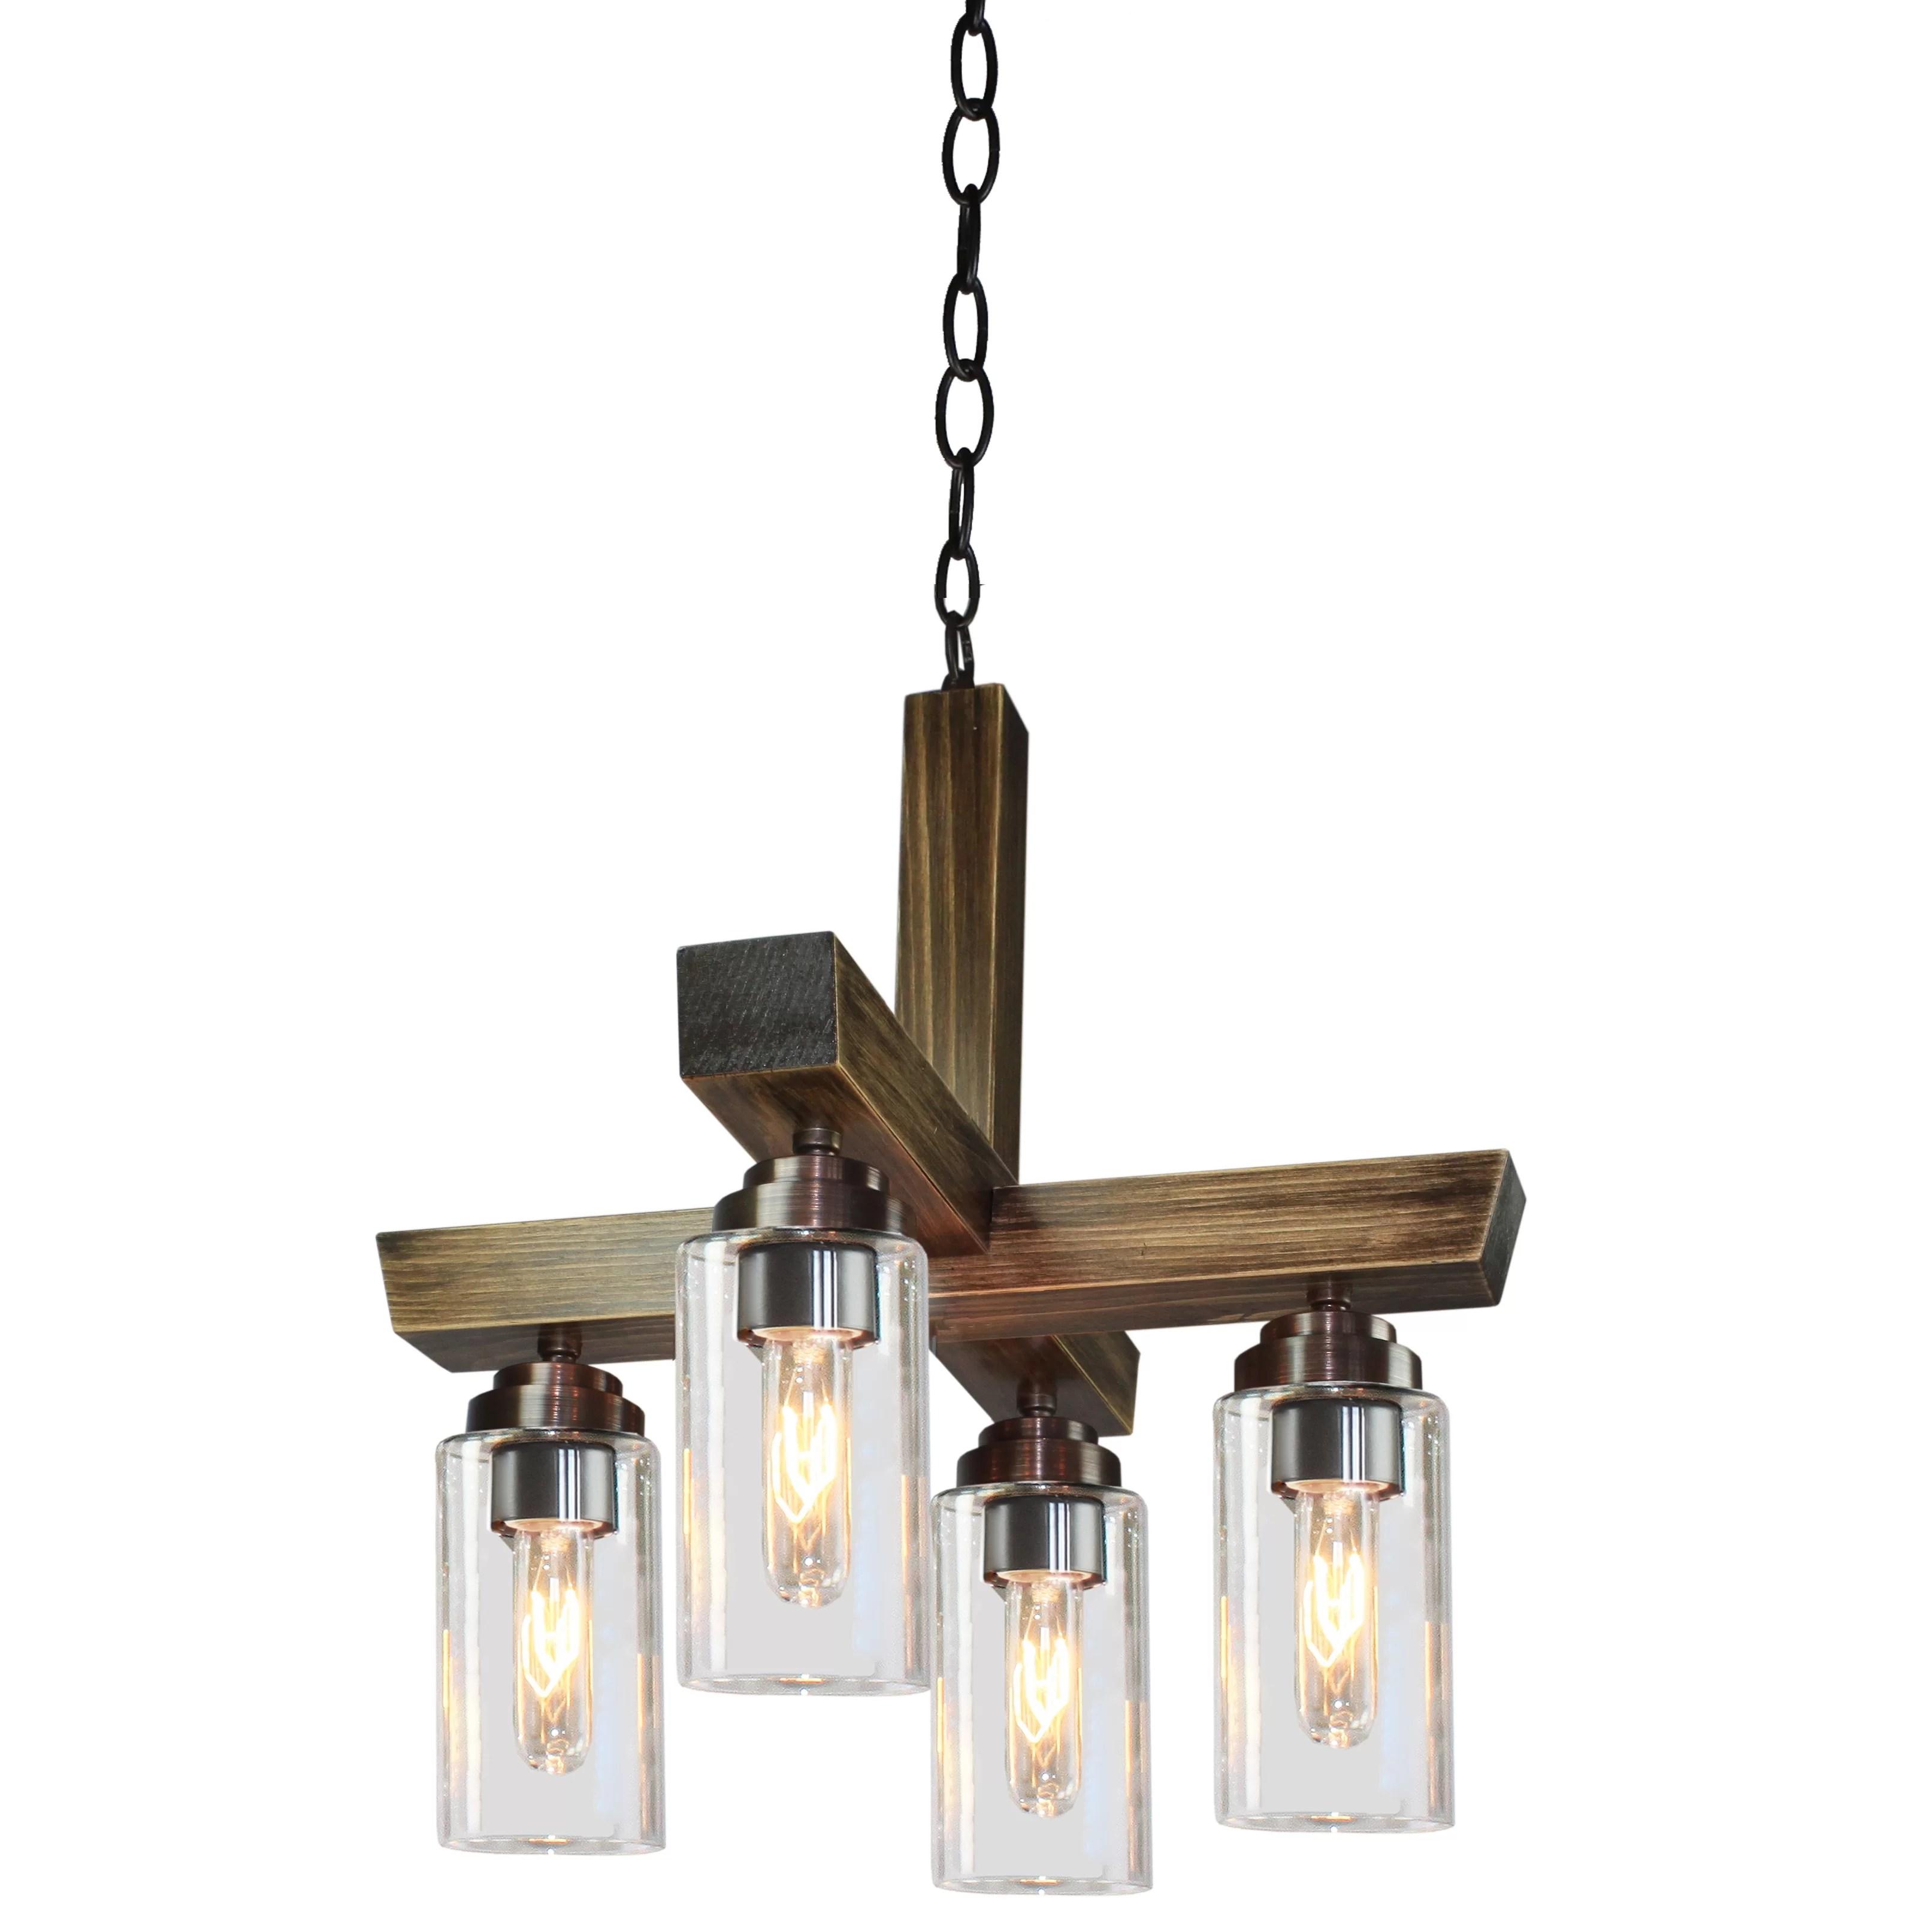 kitchen island pendant quartz countertop artcraft lighting home glow 4 light